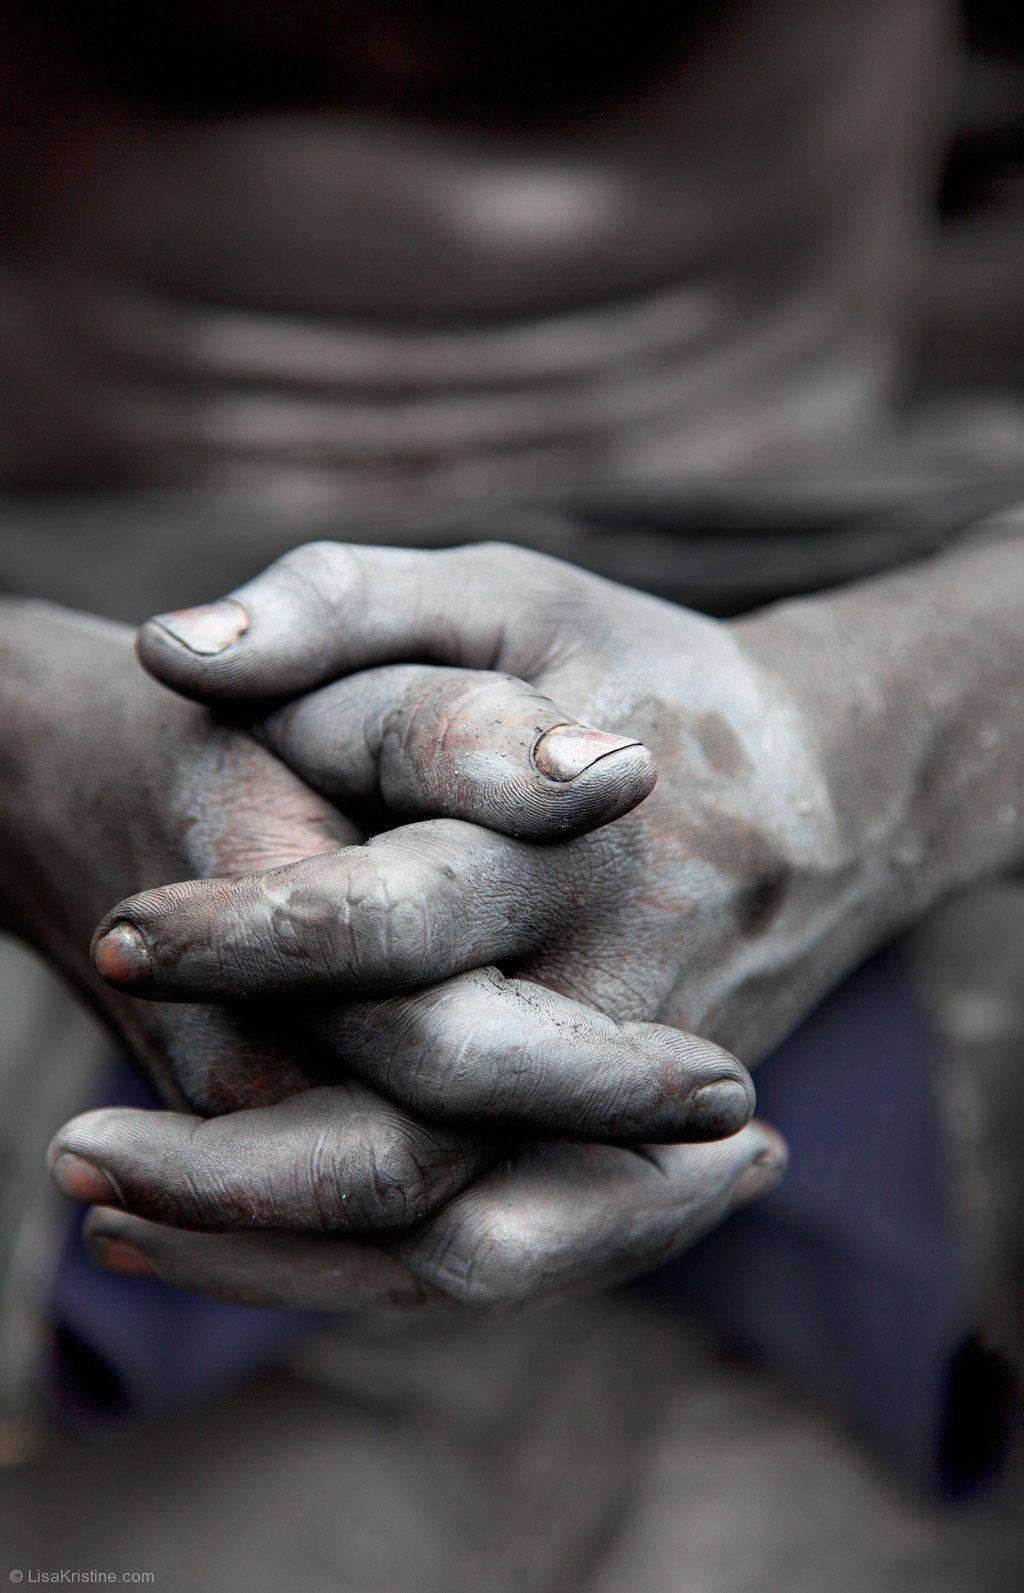 lisa_kristine_com-gold-miners-hands-ghana.jpg